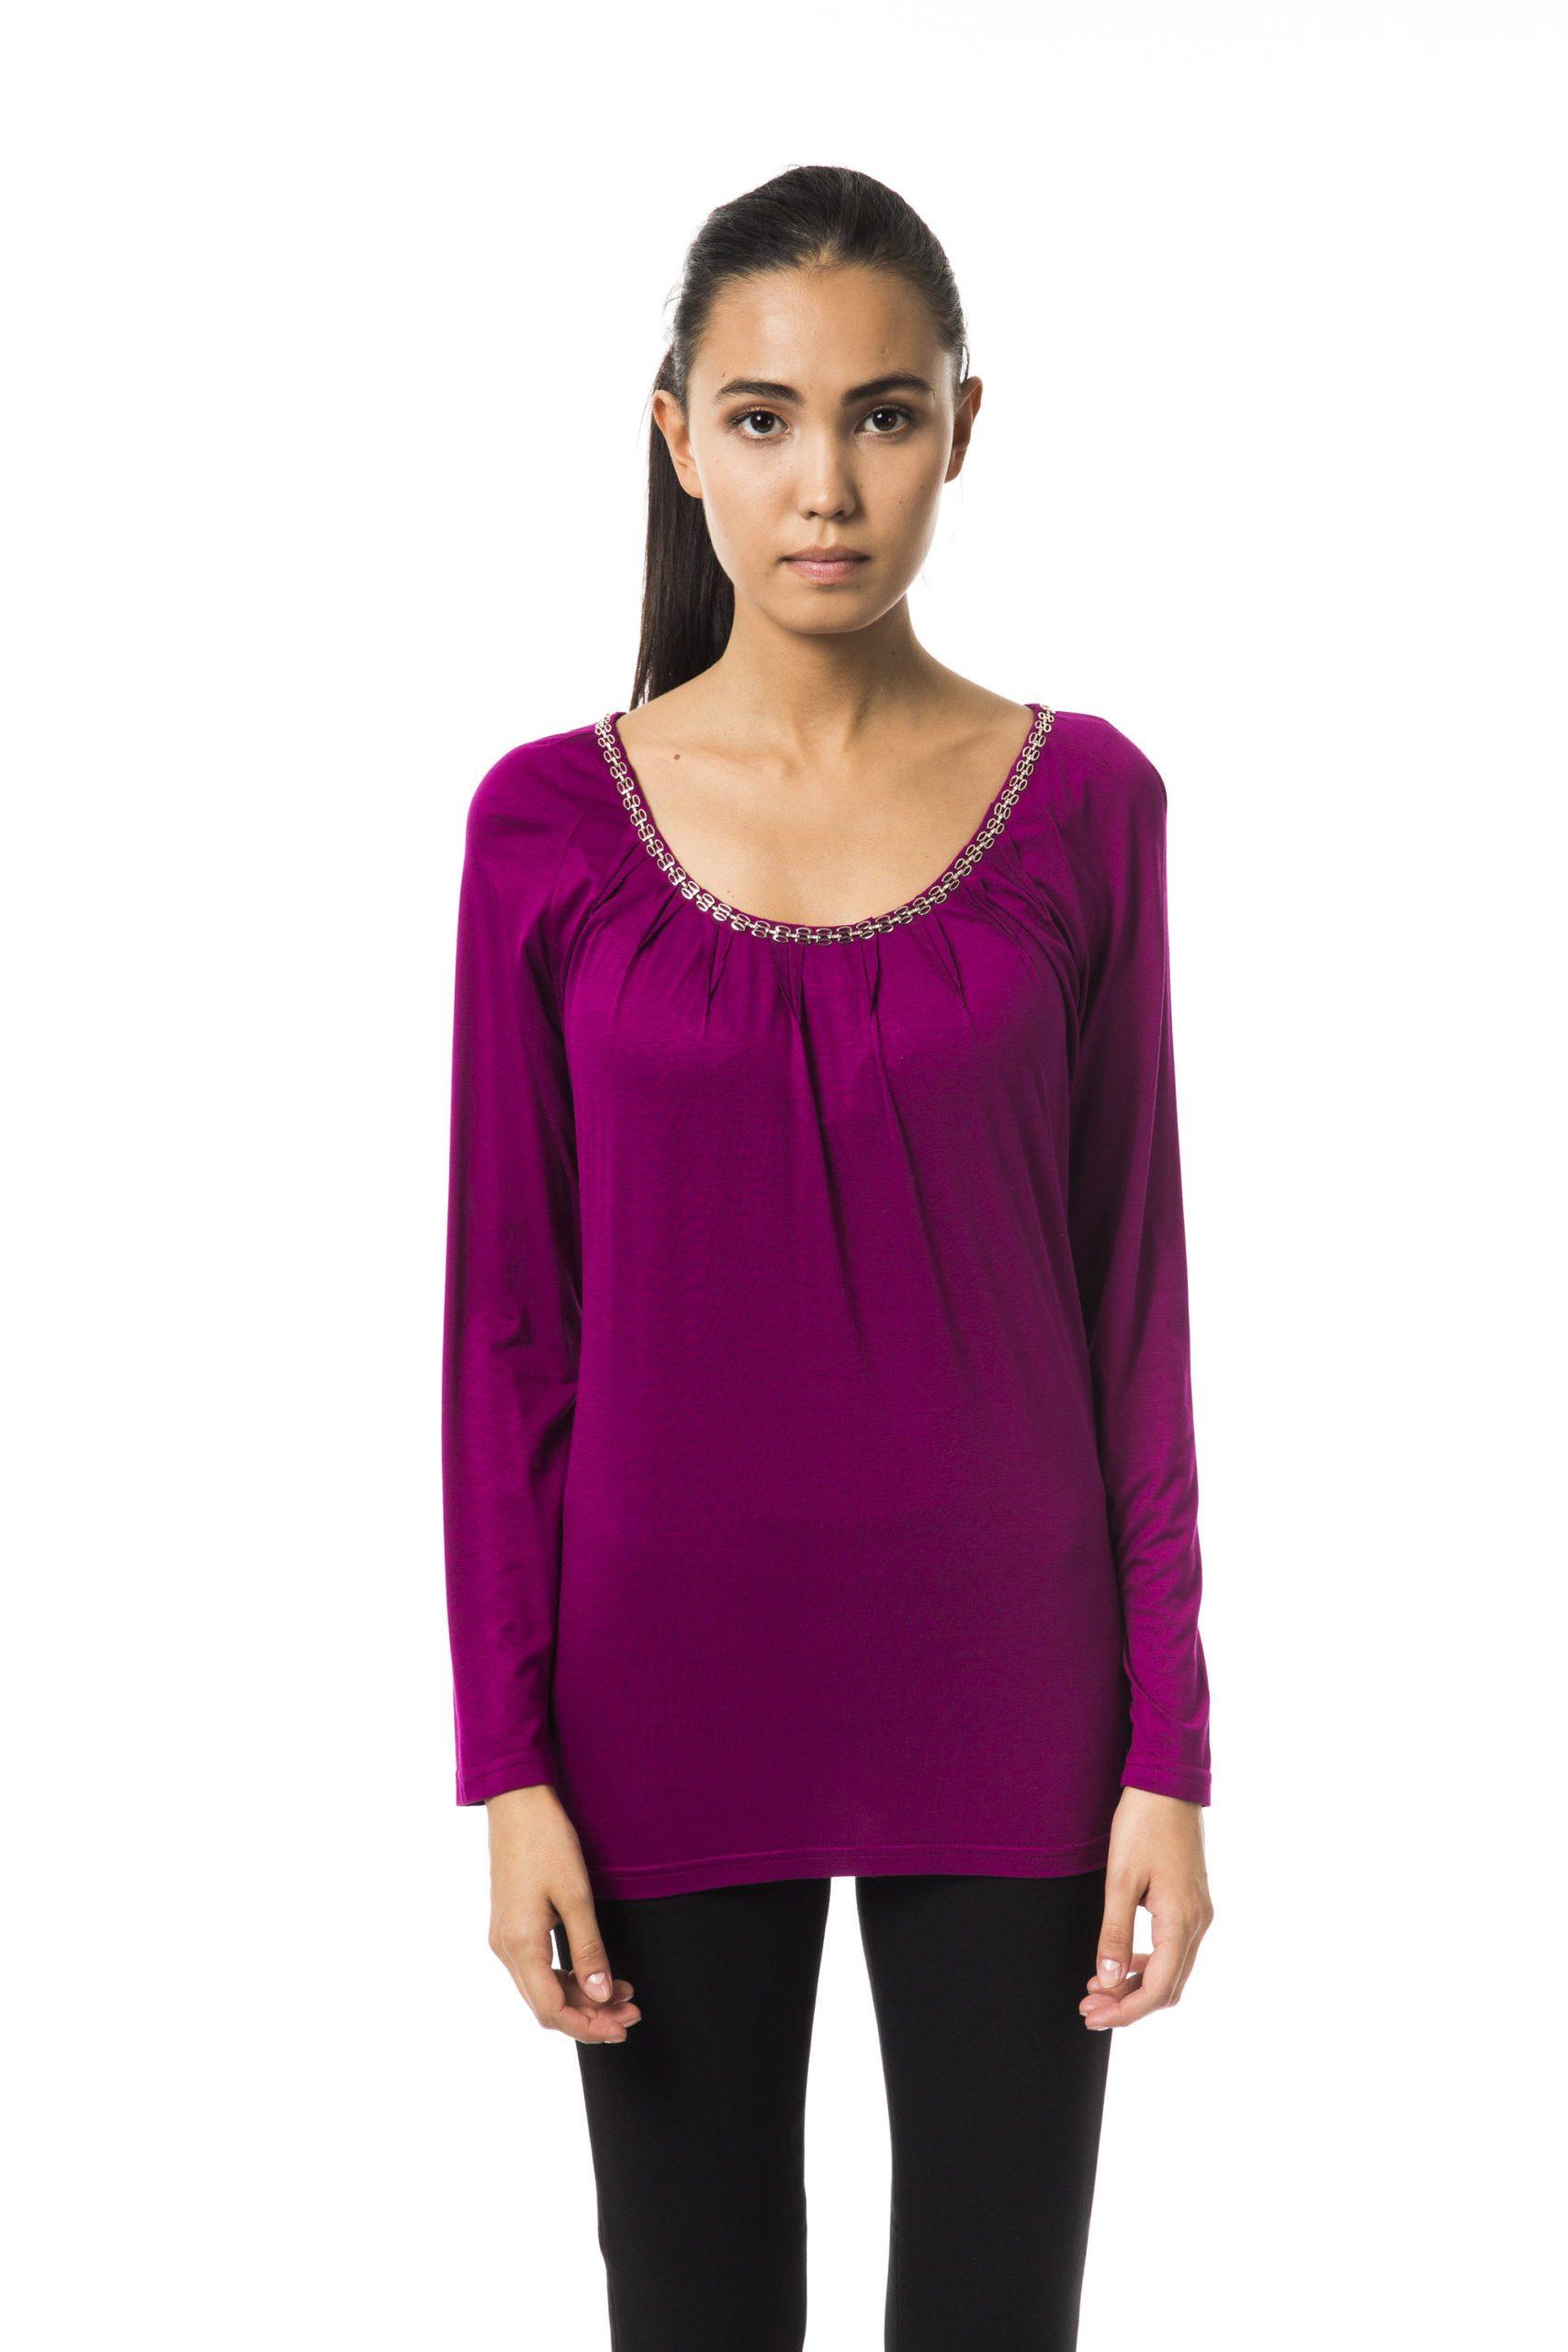 BYBLOS Women's Magentabis T-Shirt Violet BY1234734 - IT42 | S